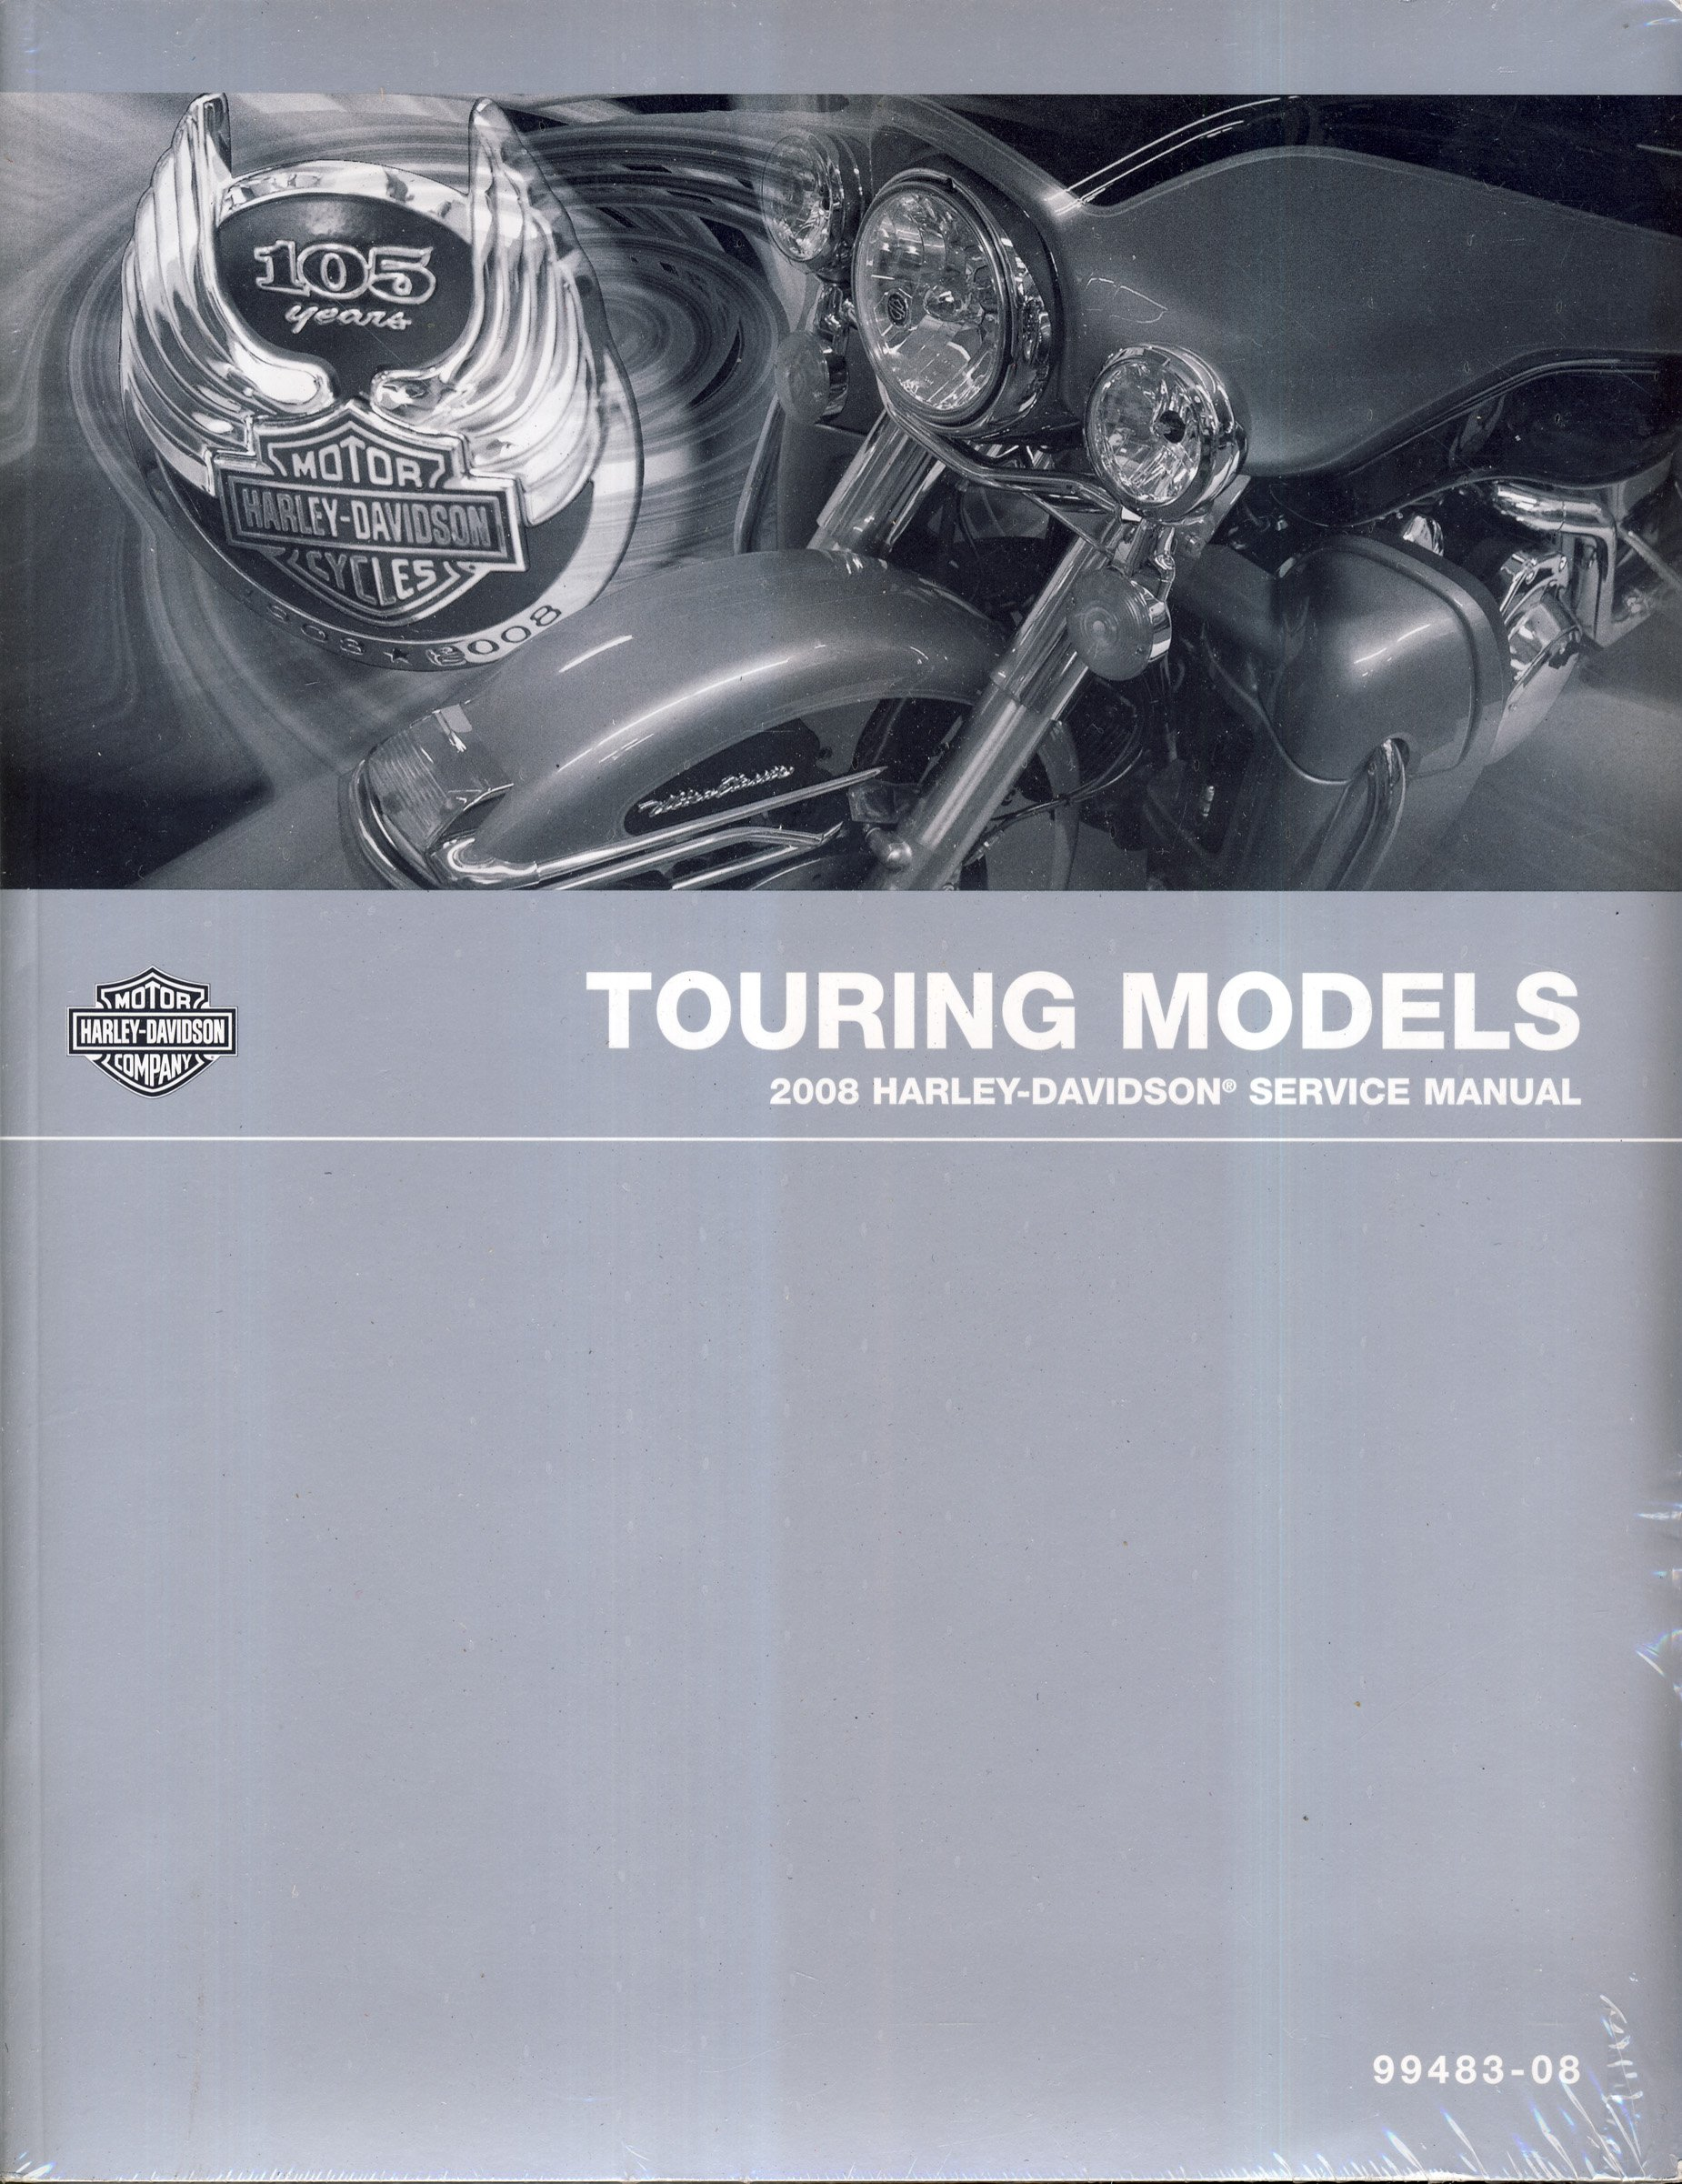 Harley Davidson 2008 Touring Models Factory Service Manual: Harley Davidson  Motor Company: Amazon.com: Books